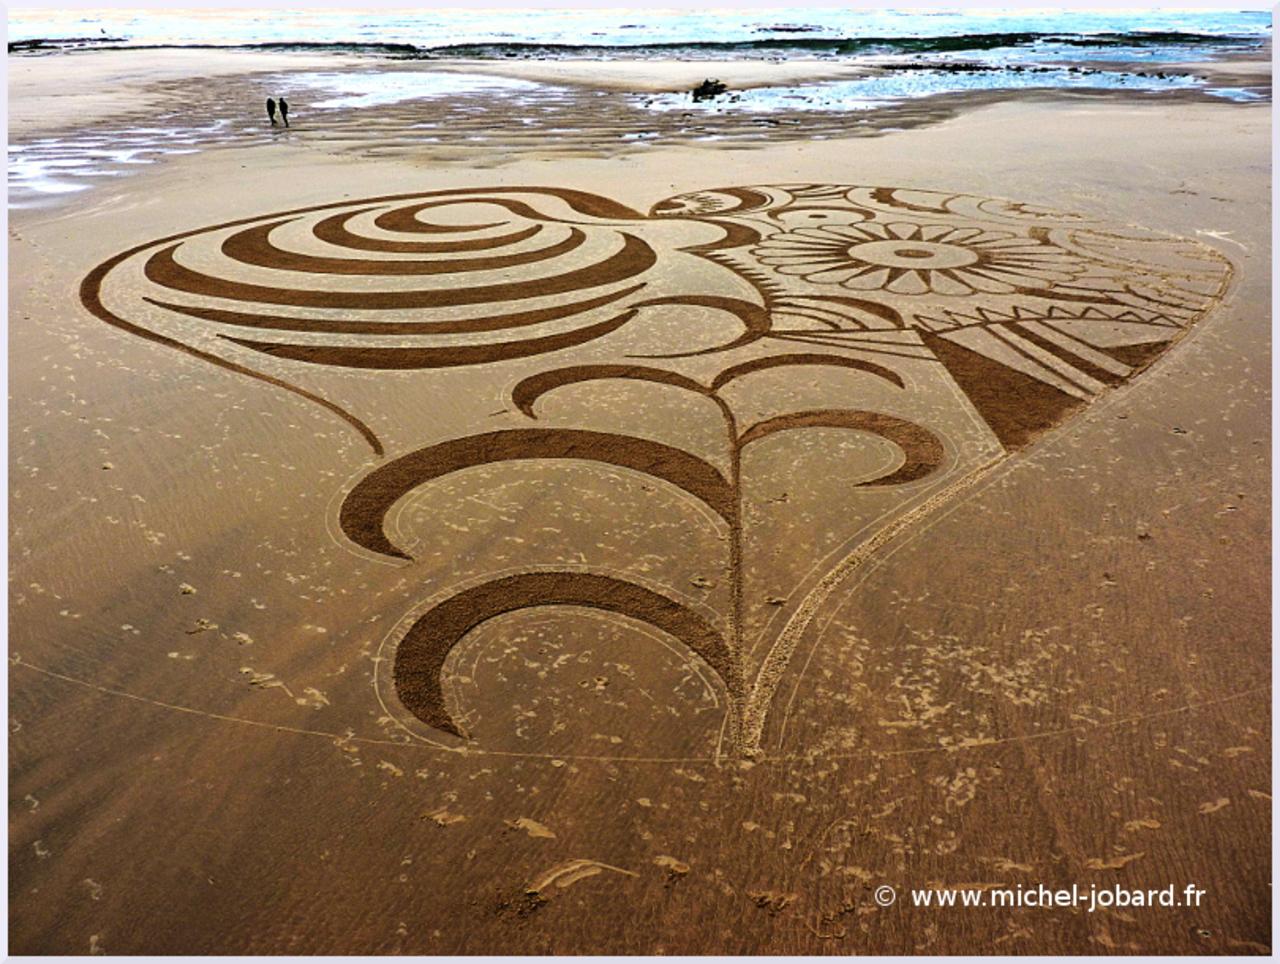 beach-art-In-the-wind-03.jpg